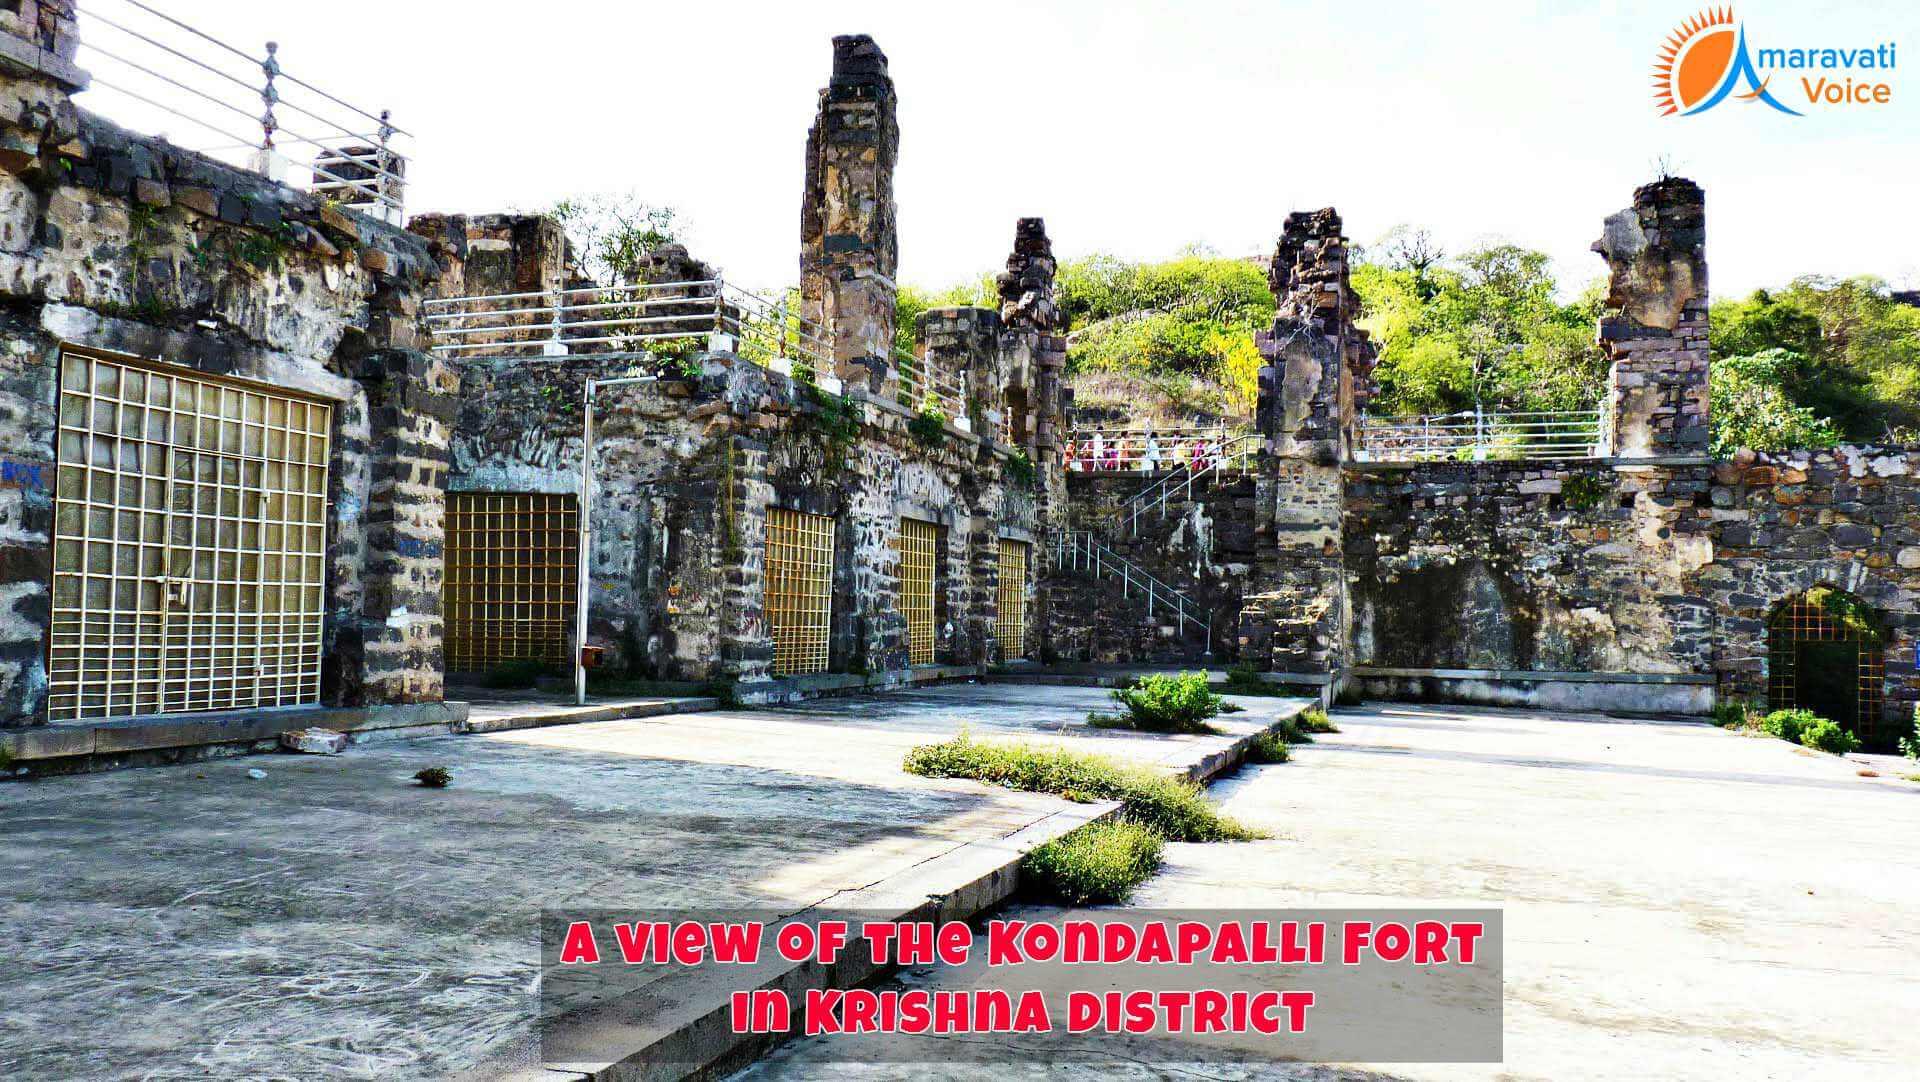 kondapalli-fort-3.jpg